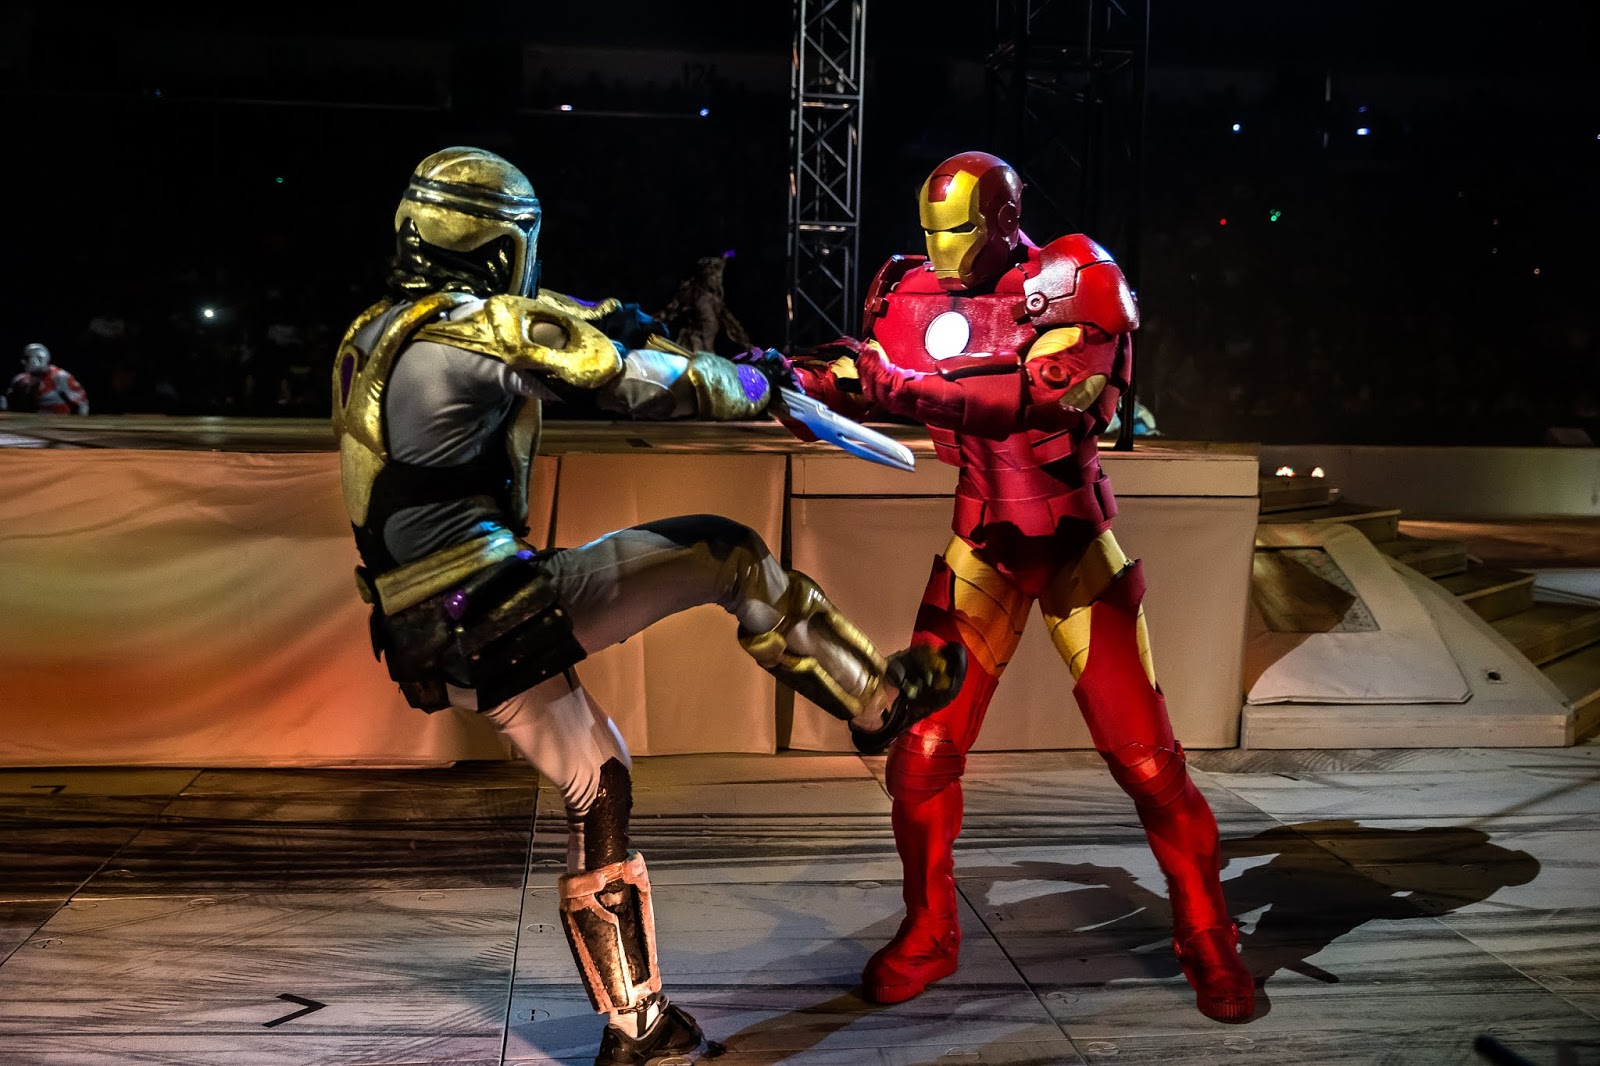 Marvel universe show iron man versus Thanos